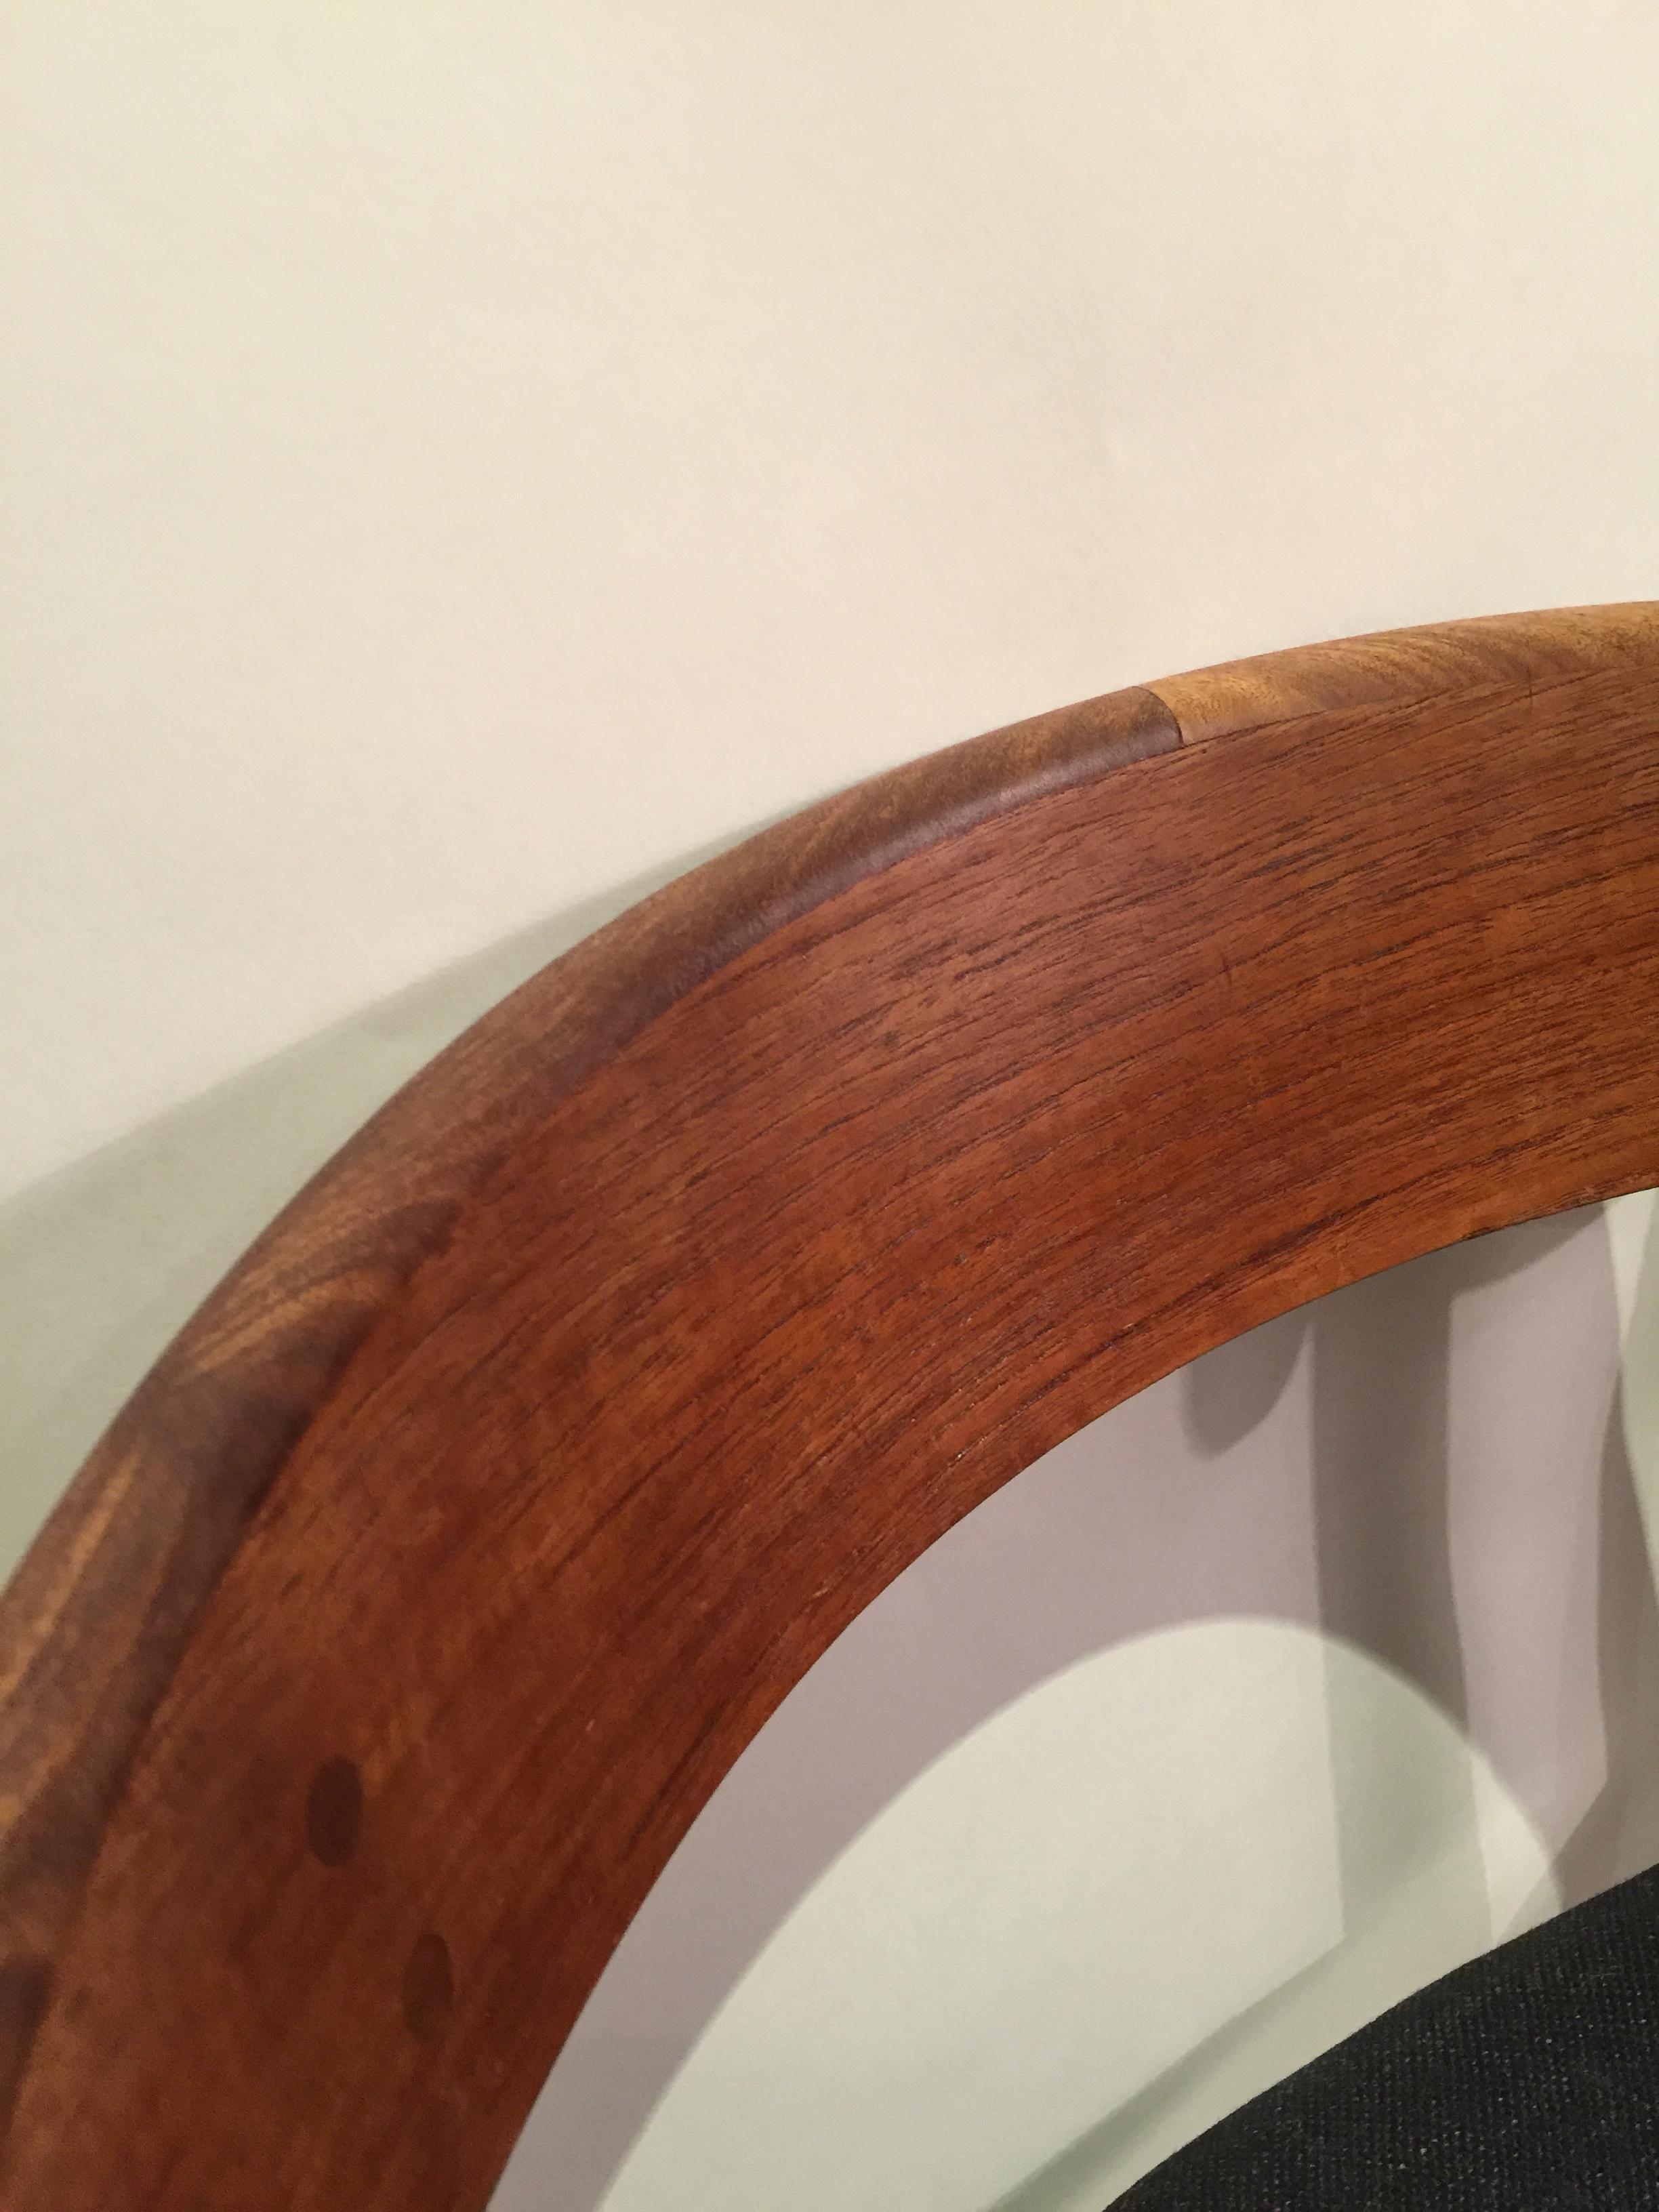 danish peg joint danish chairs in teak 9.JPG